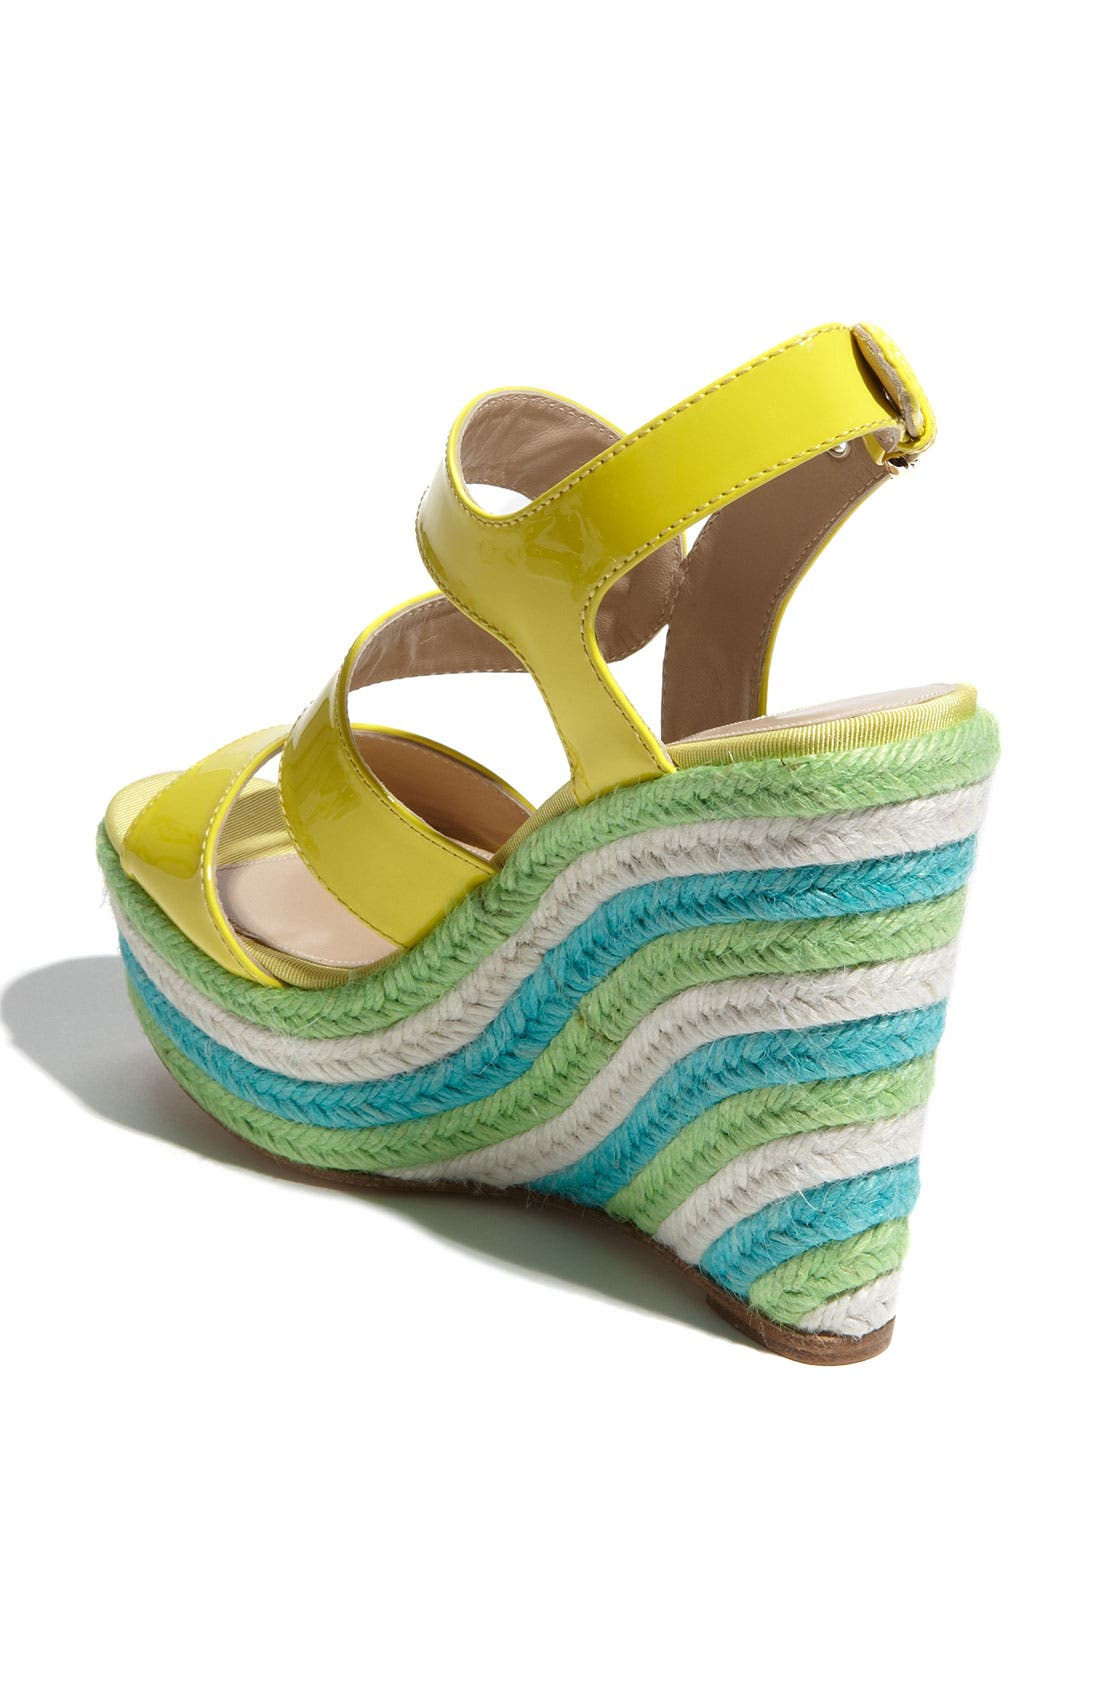 'Ariane' Espadrille Wedge Sandal,                             Alternate thumbnail 2, color,